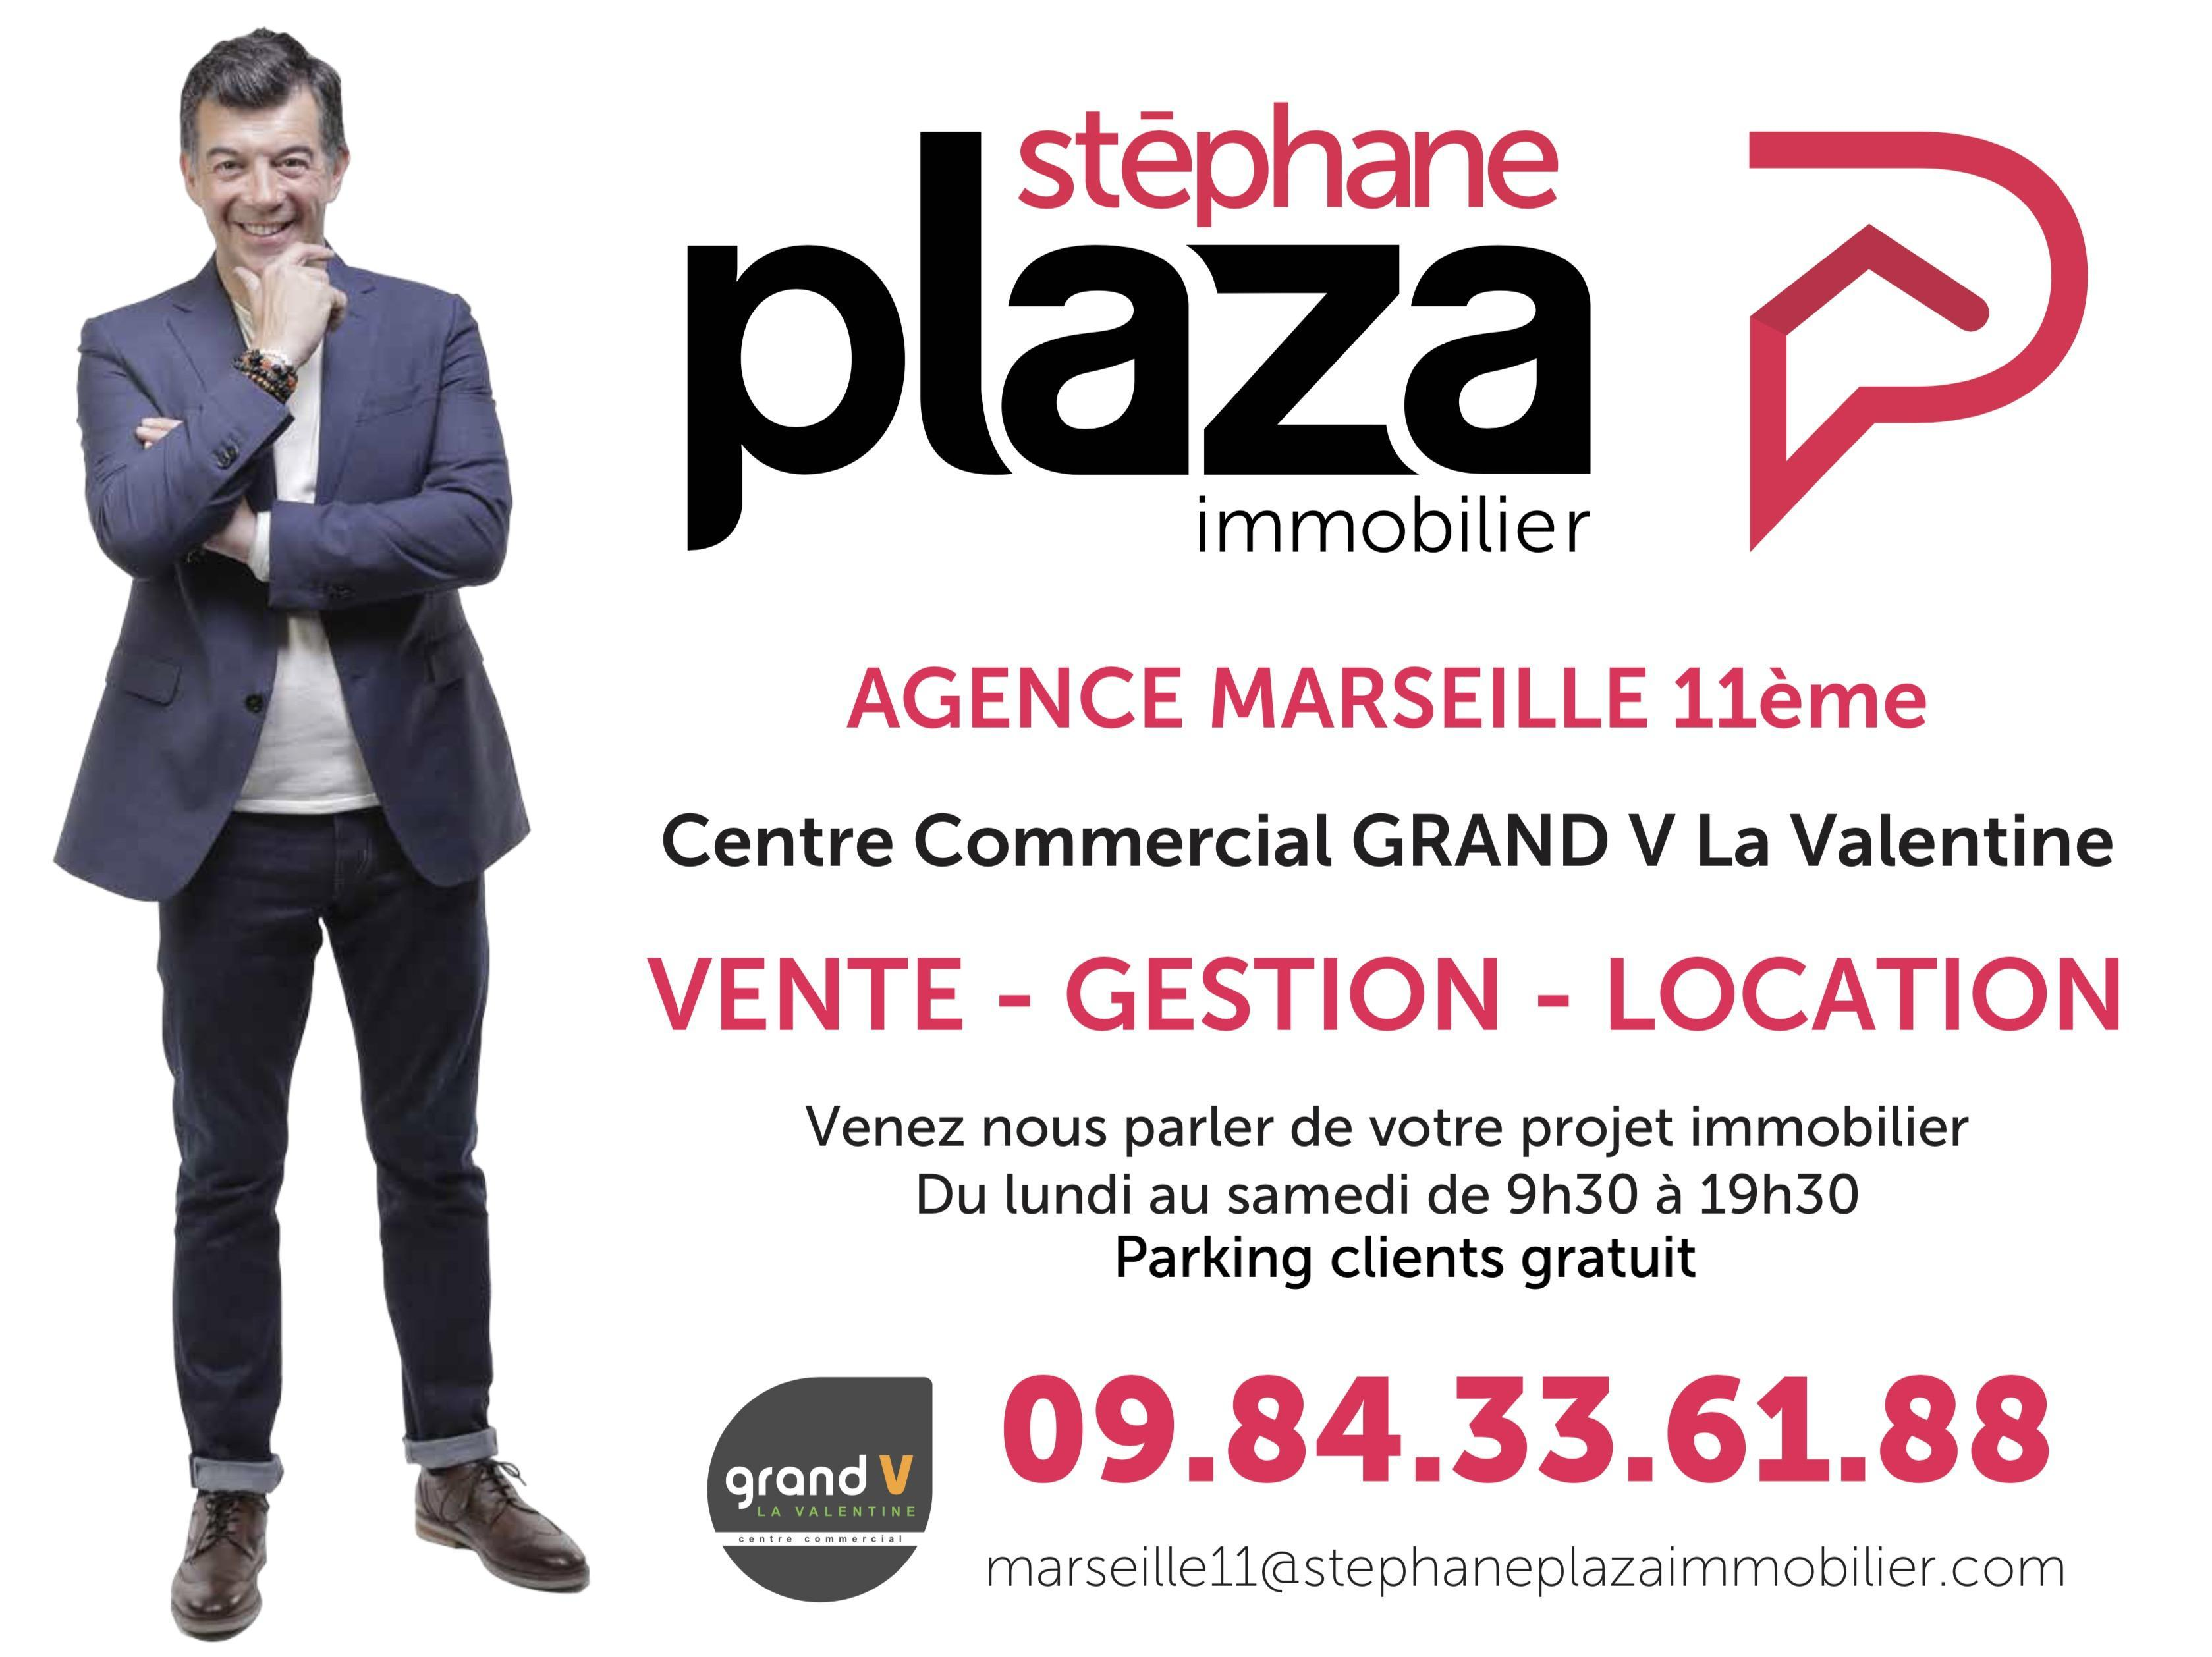 Stephane Plaza Immobilier Marseille 11 agence immobilière Marseille 11 (13011)